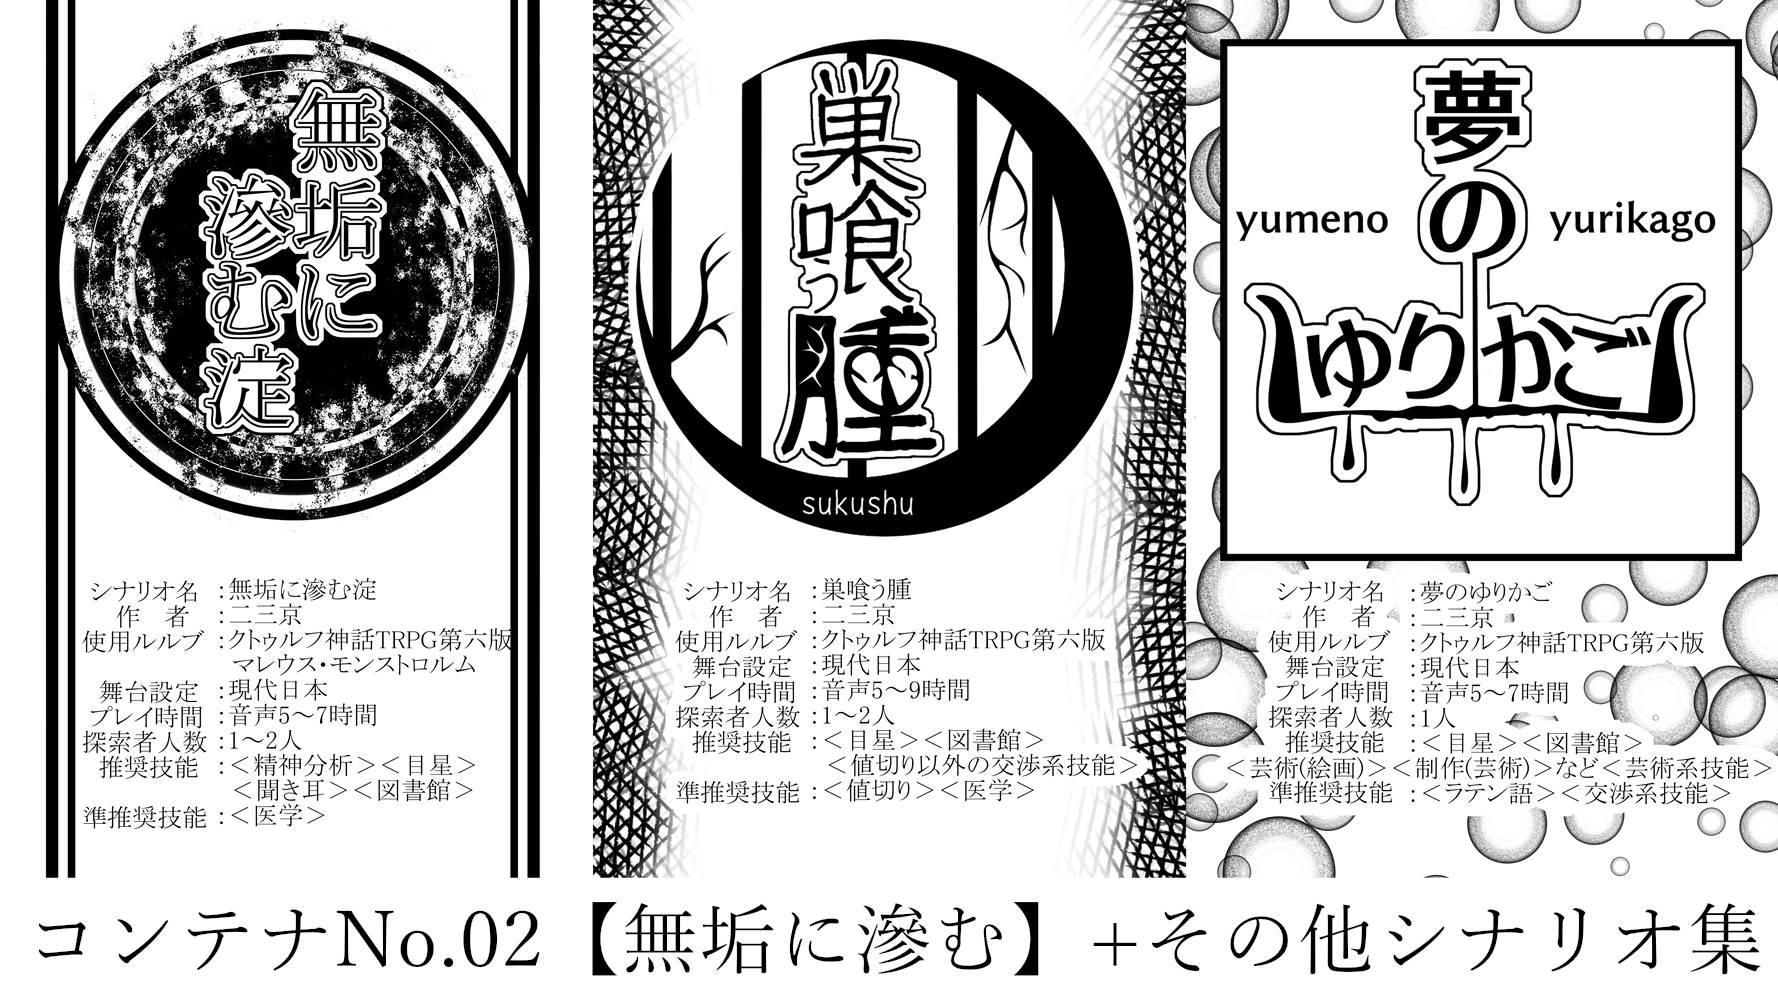 【CoC6版シナリオ】コンテナNo.02【無垢に滲む】